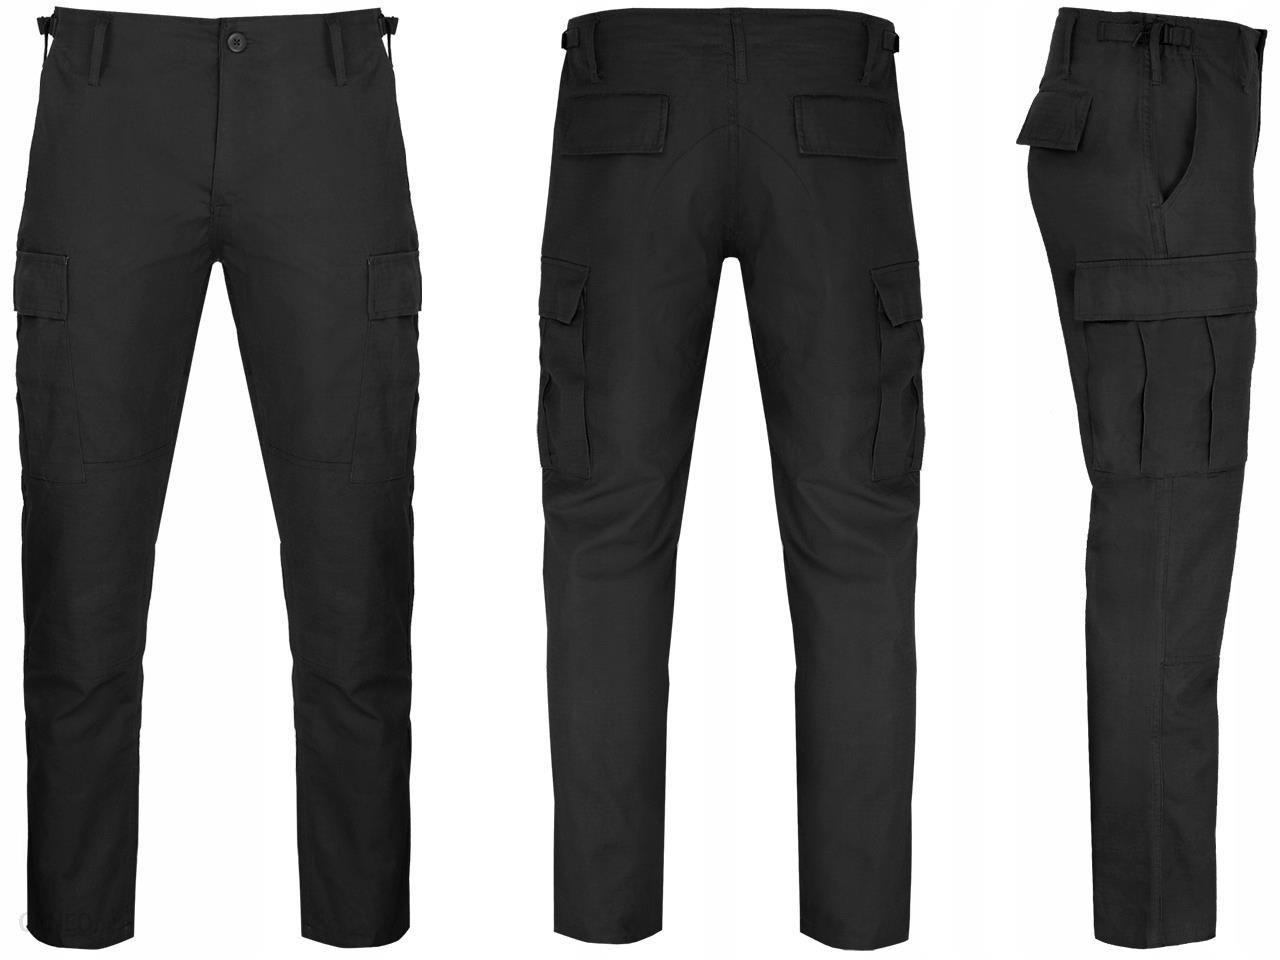 Teesar Spodnie Wojskowe Bdu Slim Fit r/s Czarne XL